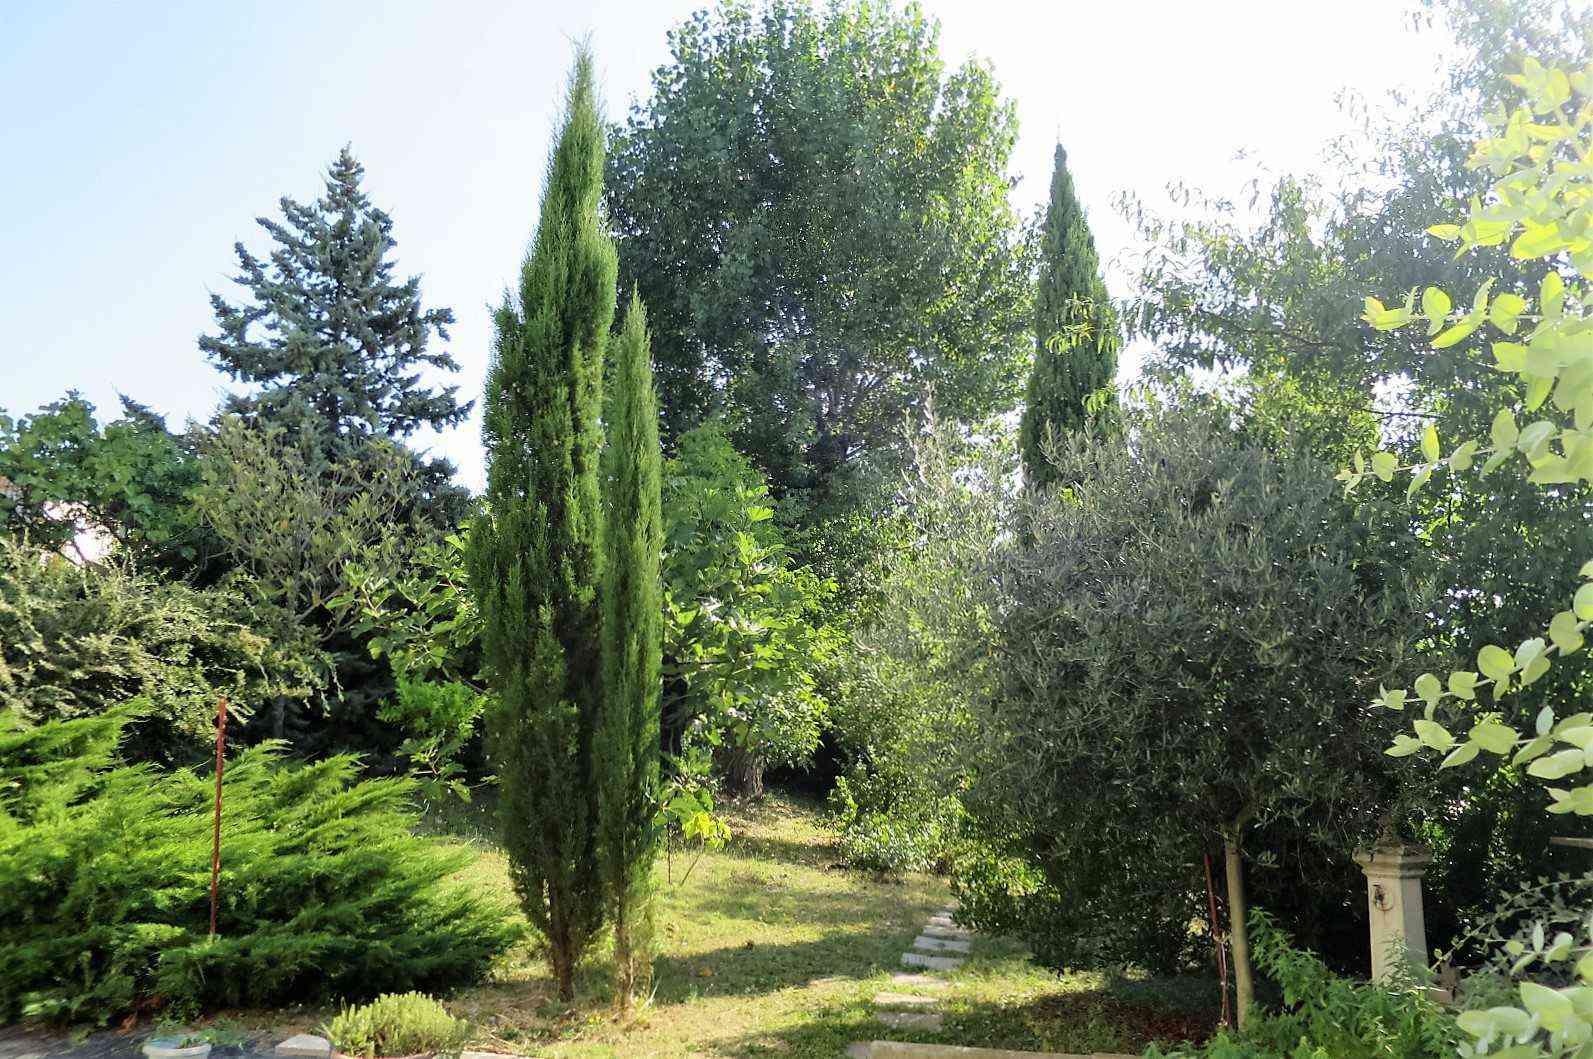 Villa Villa in vendita Atri (TE), Villa Paola - Atri - EUR 473.281 250